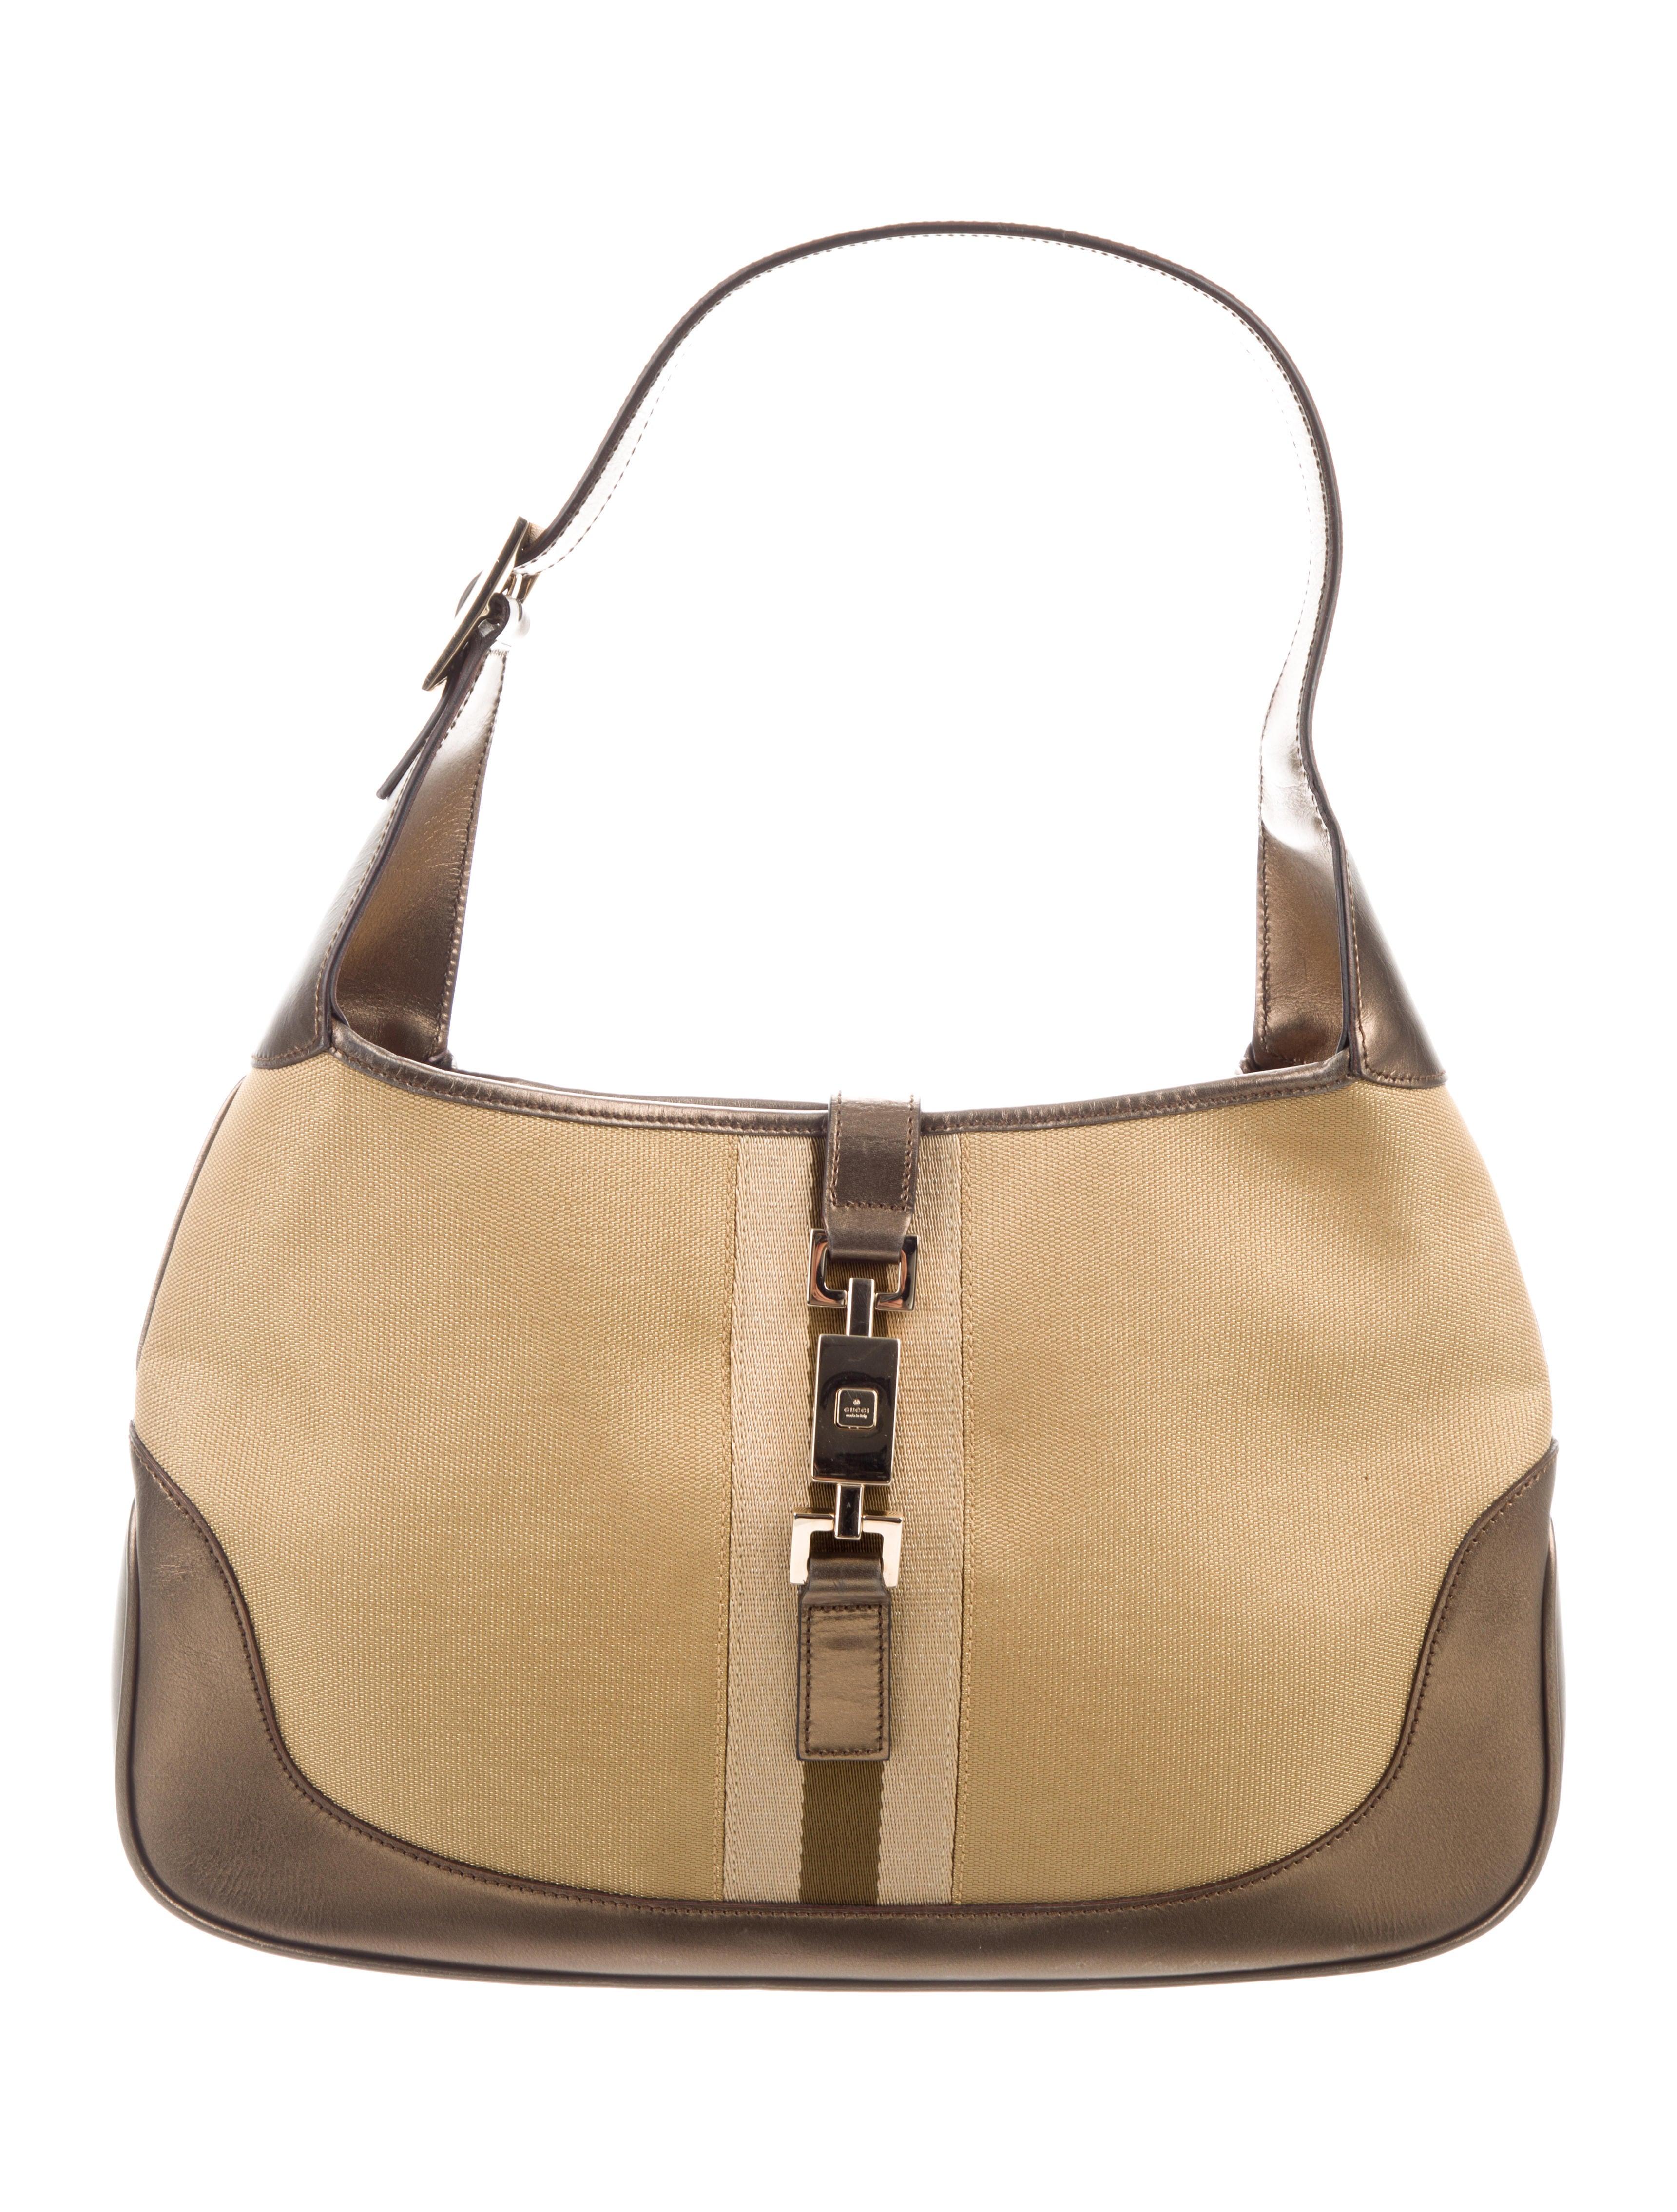 e44f791f1be Gucci Belt Bag Canada